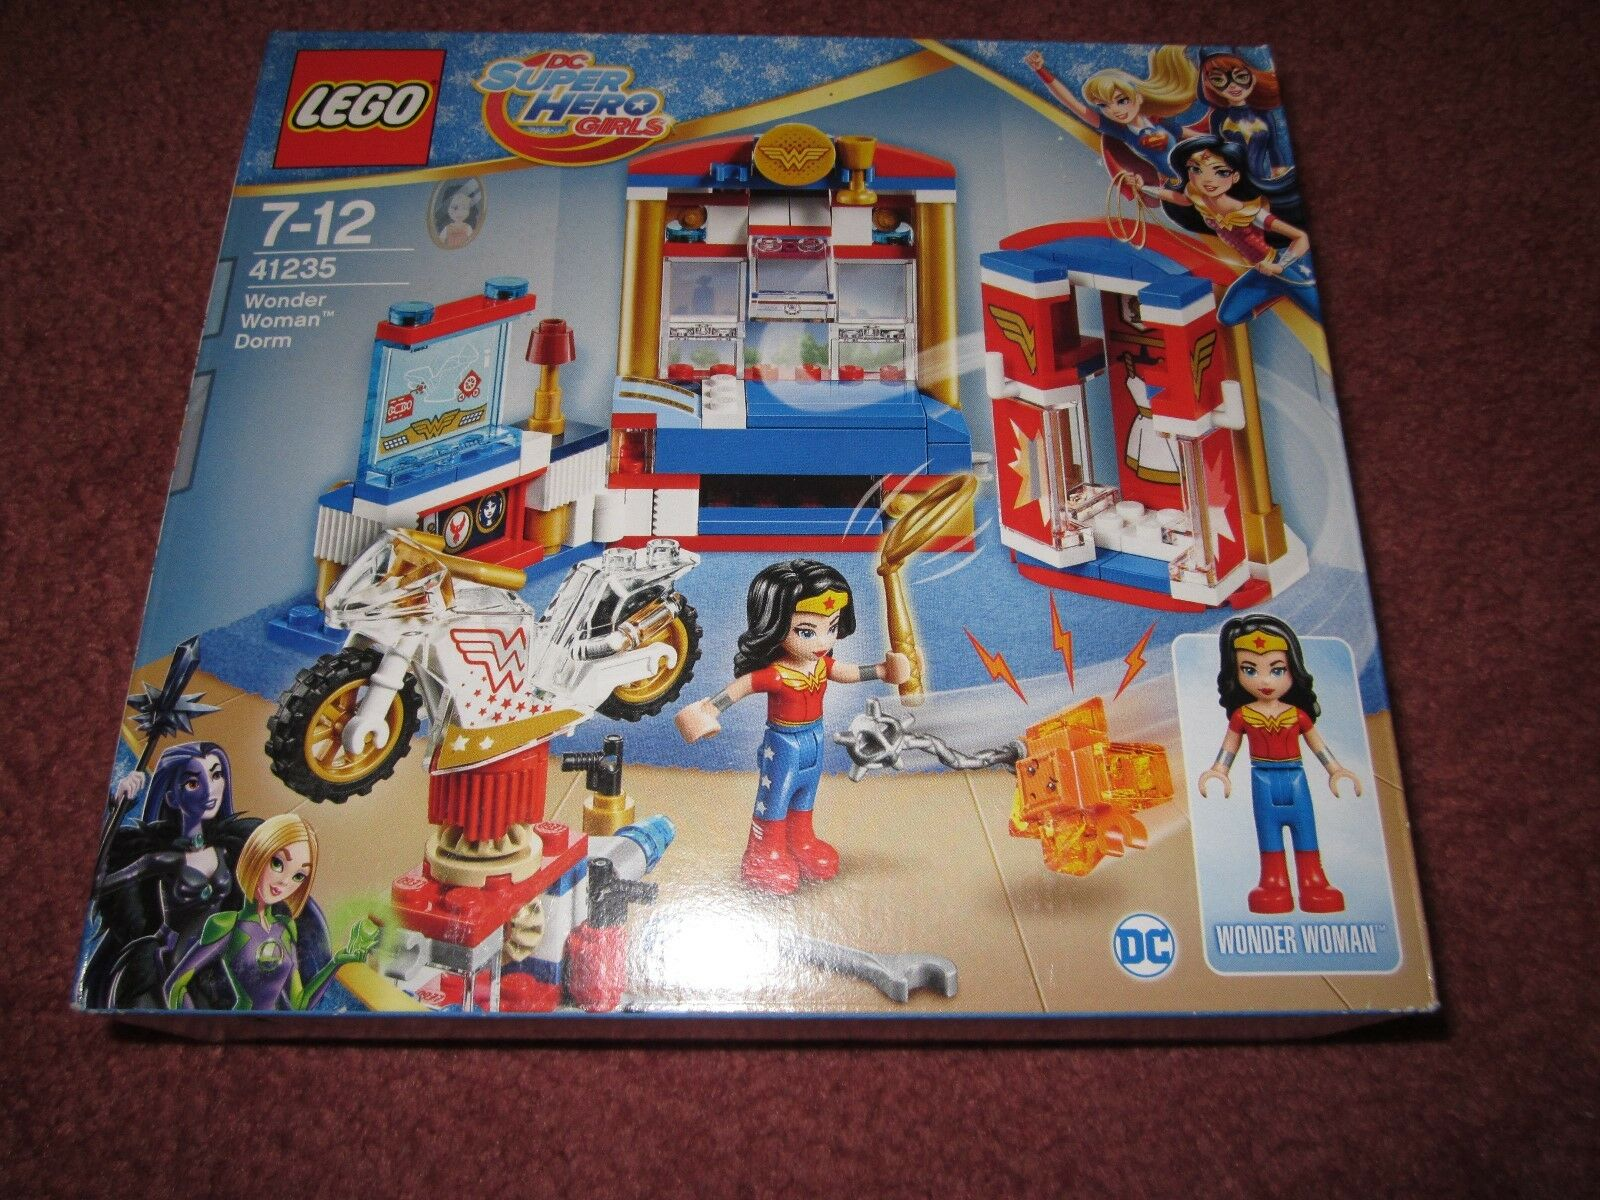 LEGO SUPER HERO GIRLS WONDER WOMAN DORM DORM DORM 41235 - NEW BOXED SEALED 18ee58